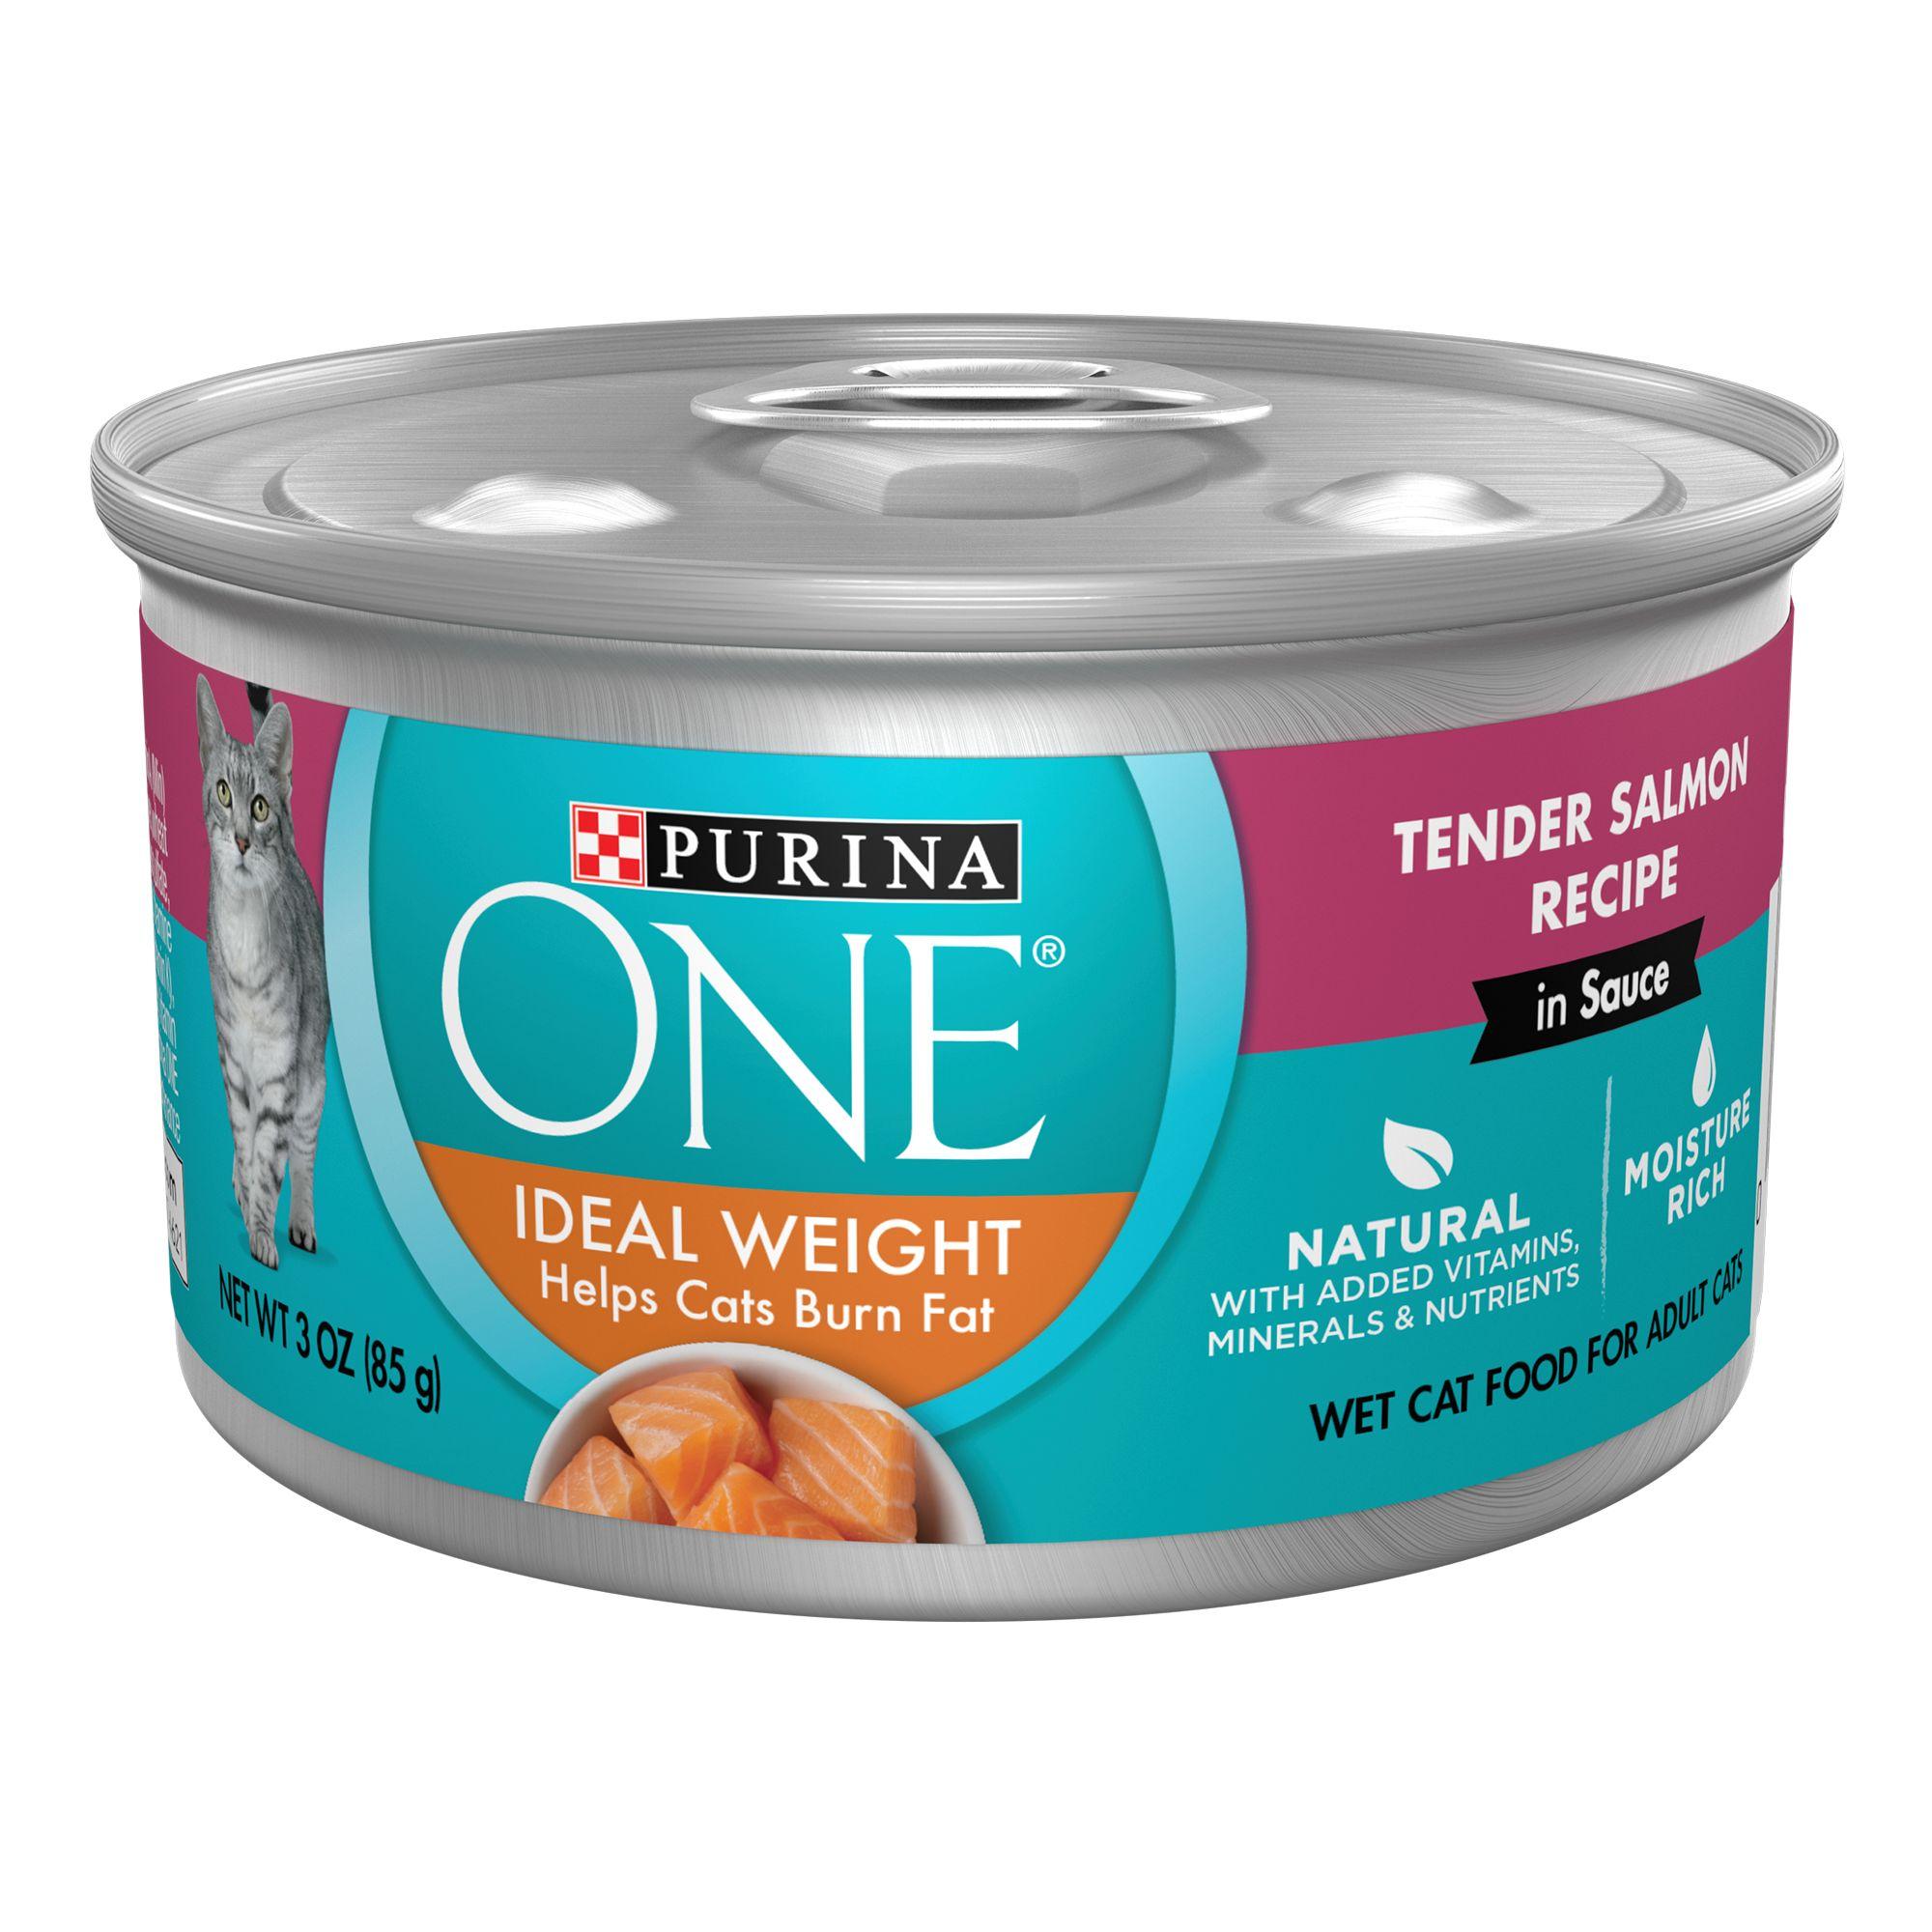 Purinareg Onereg Smartblend Healthy Metabolism Adult Cat Food Size 3 Oz